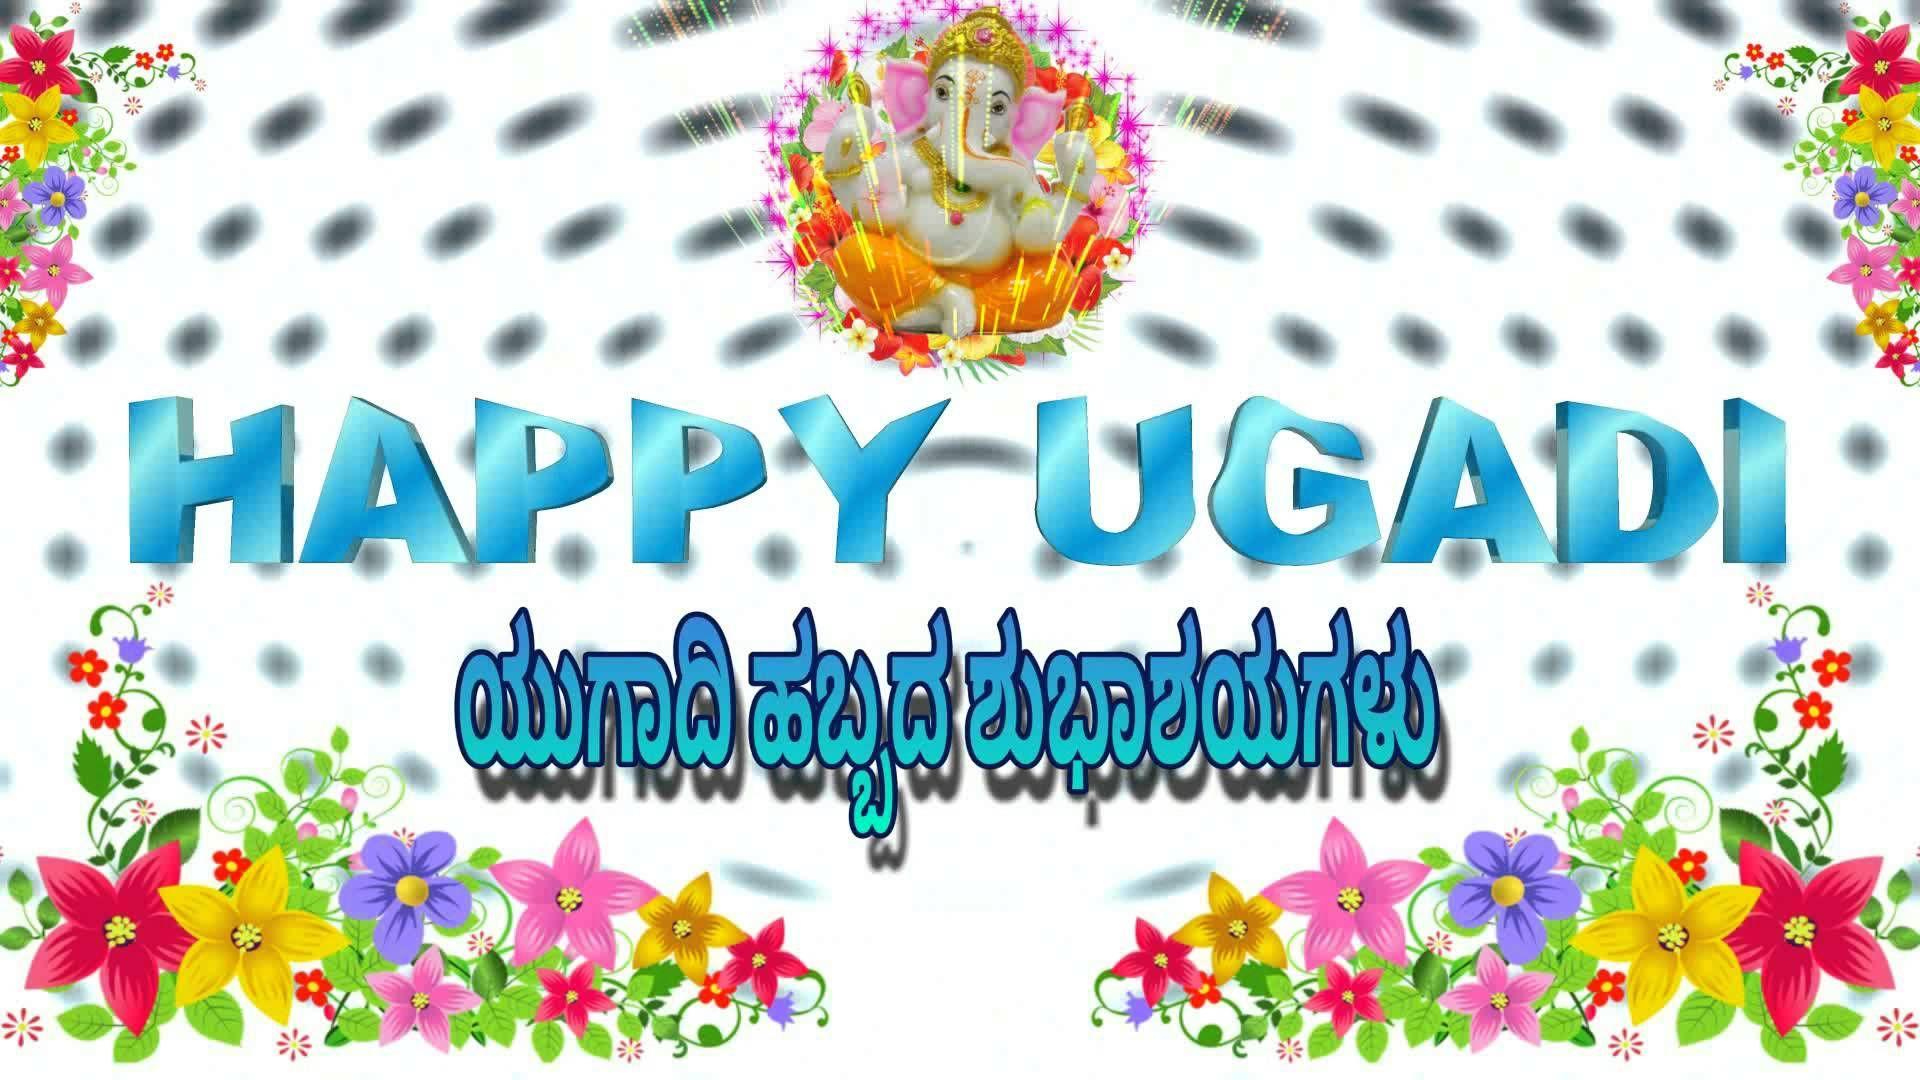 Happy ugadi 2016 in kannada ugadi kannada wishes animation kannada happy ugadi 2016 in kannada ugadi kannada wishes animation kannada uga m4hsunfo